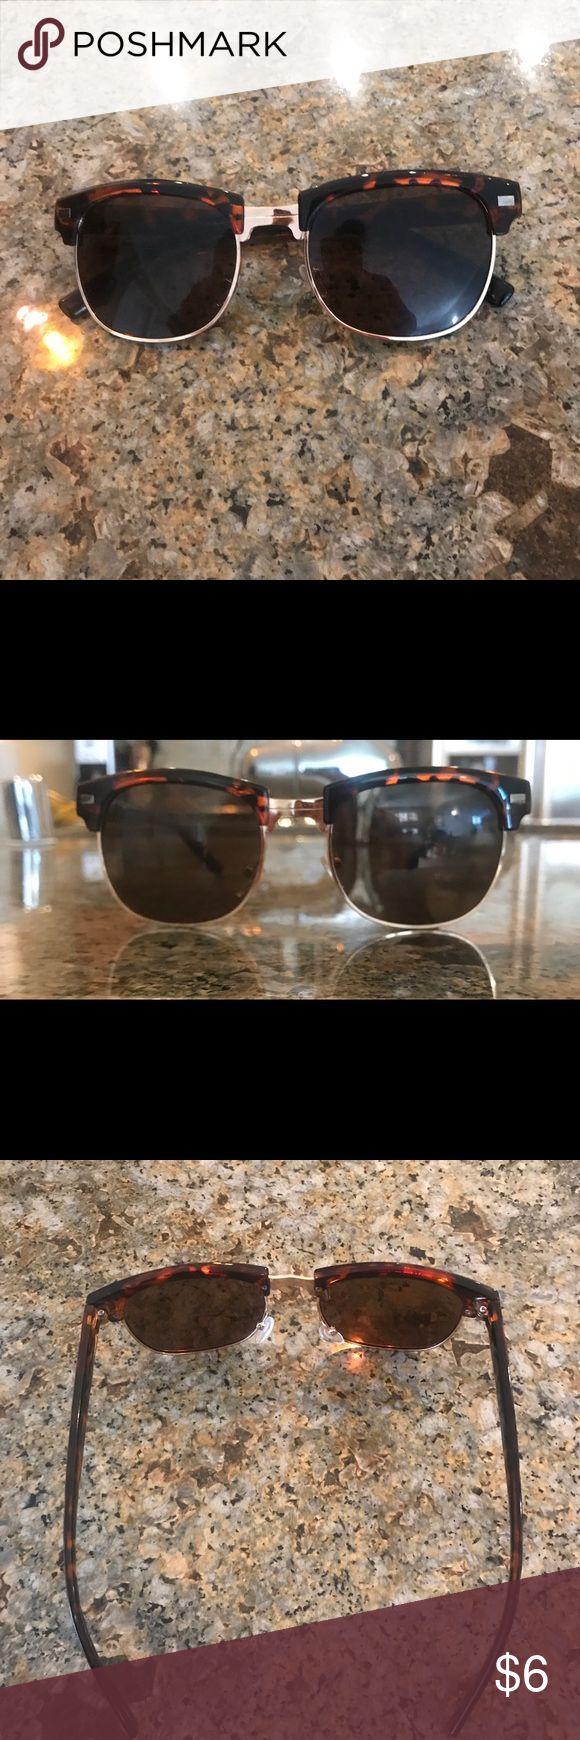 Cute Tortoise shell looking sunglasses 🕶 New Tortoise shell 🐚looking sunglasses 🕶 Accessories Glasses